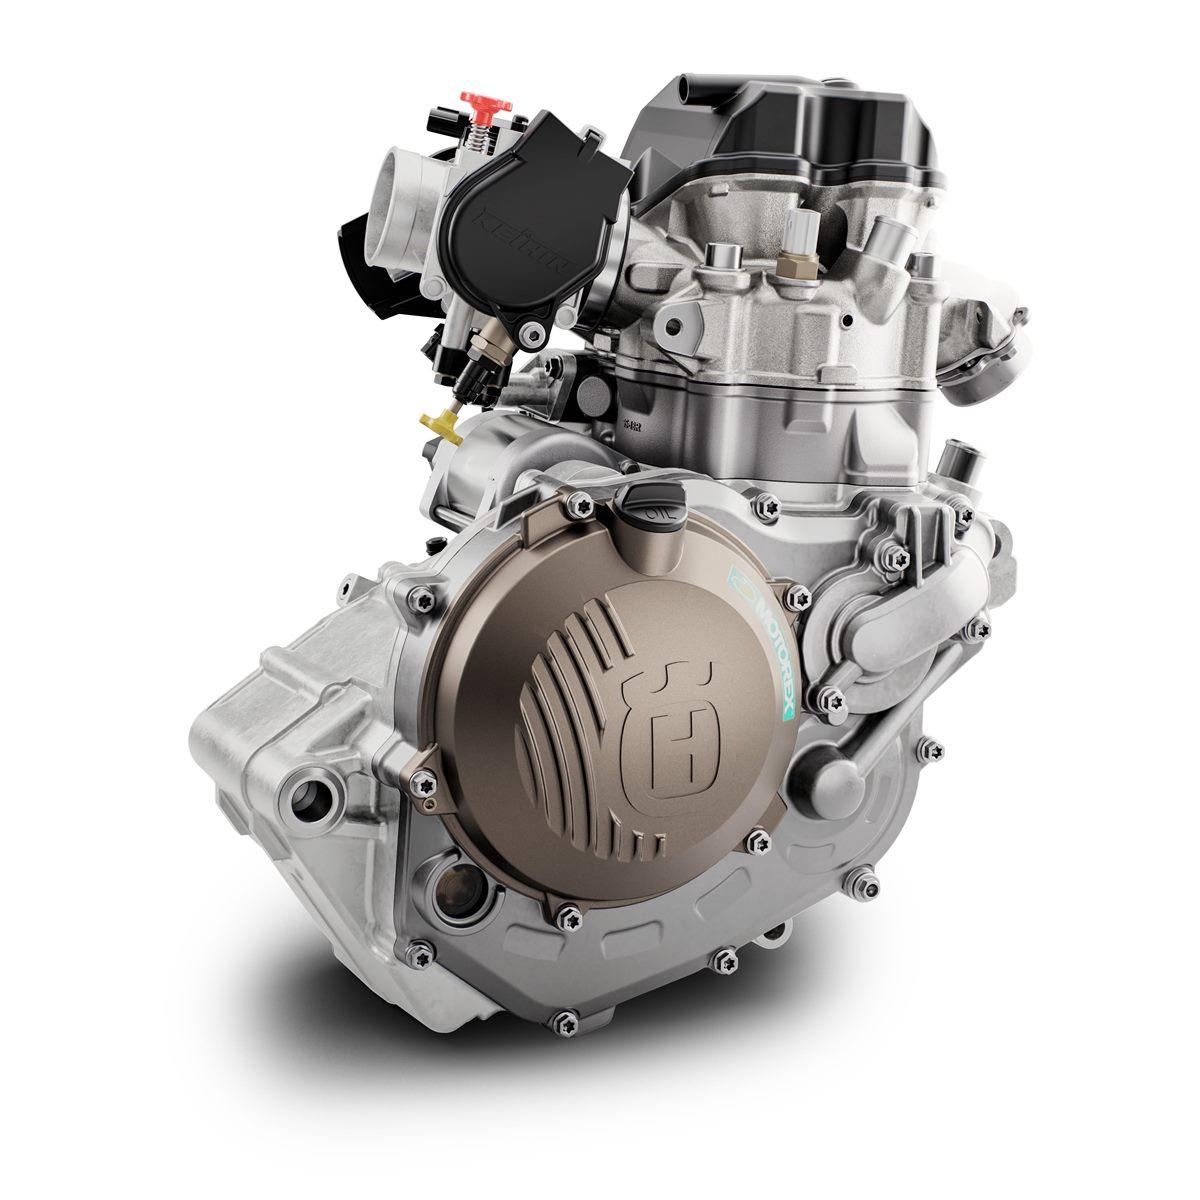 FS 450 MY20 Engine Right